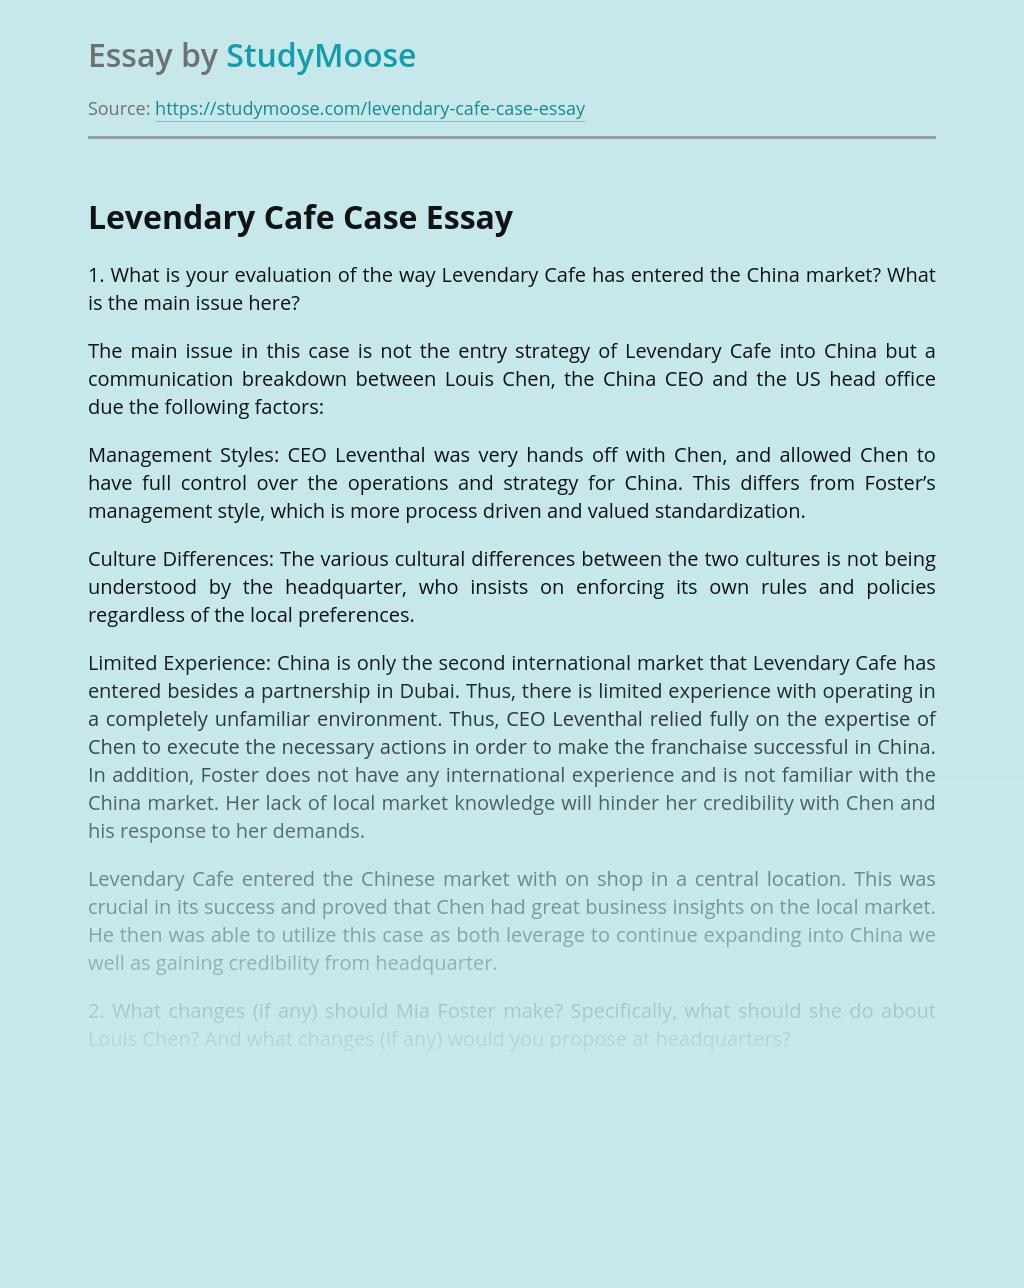 Levendary Cafe Entered the China Market